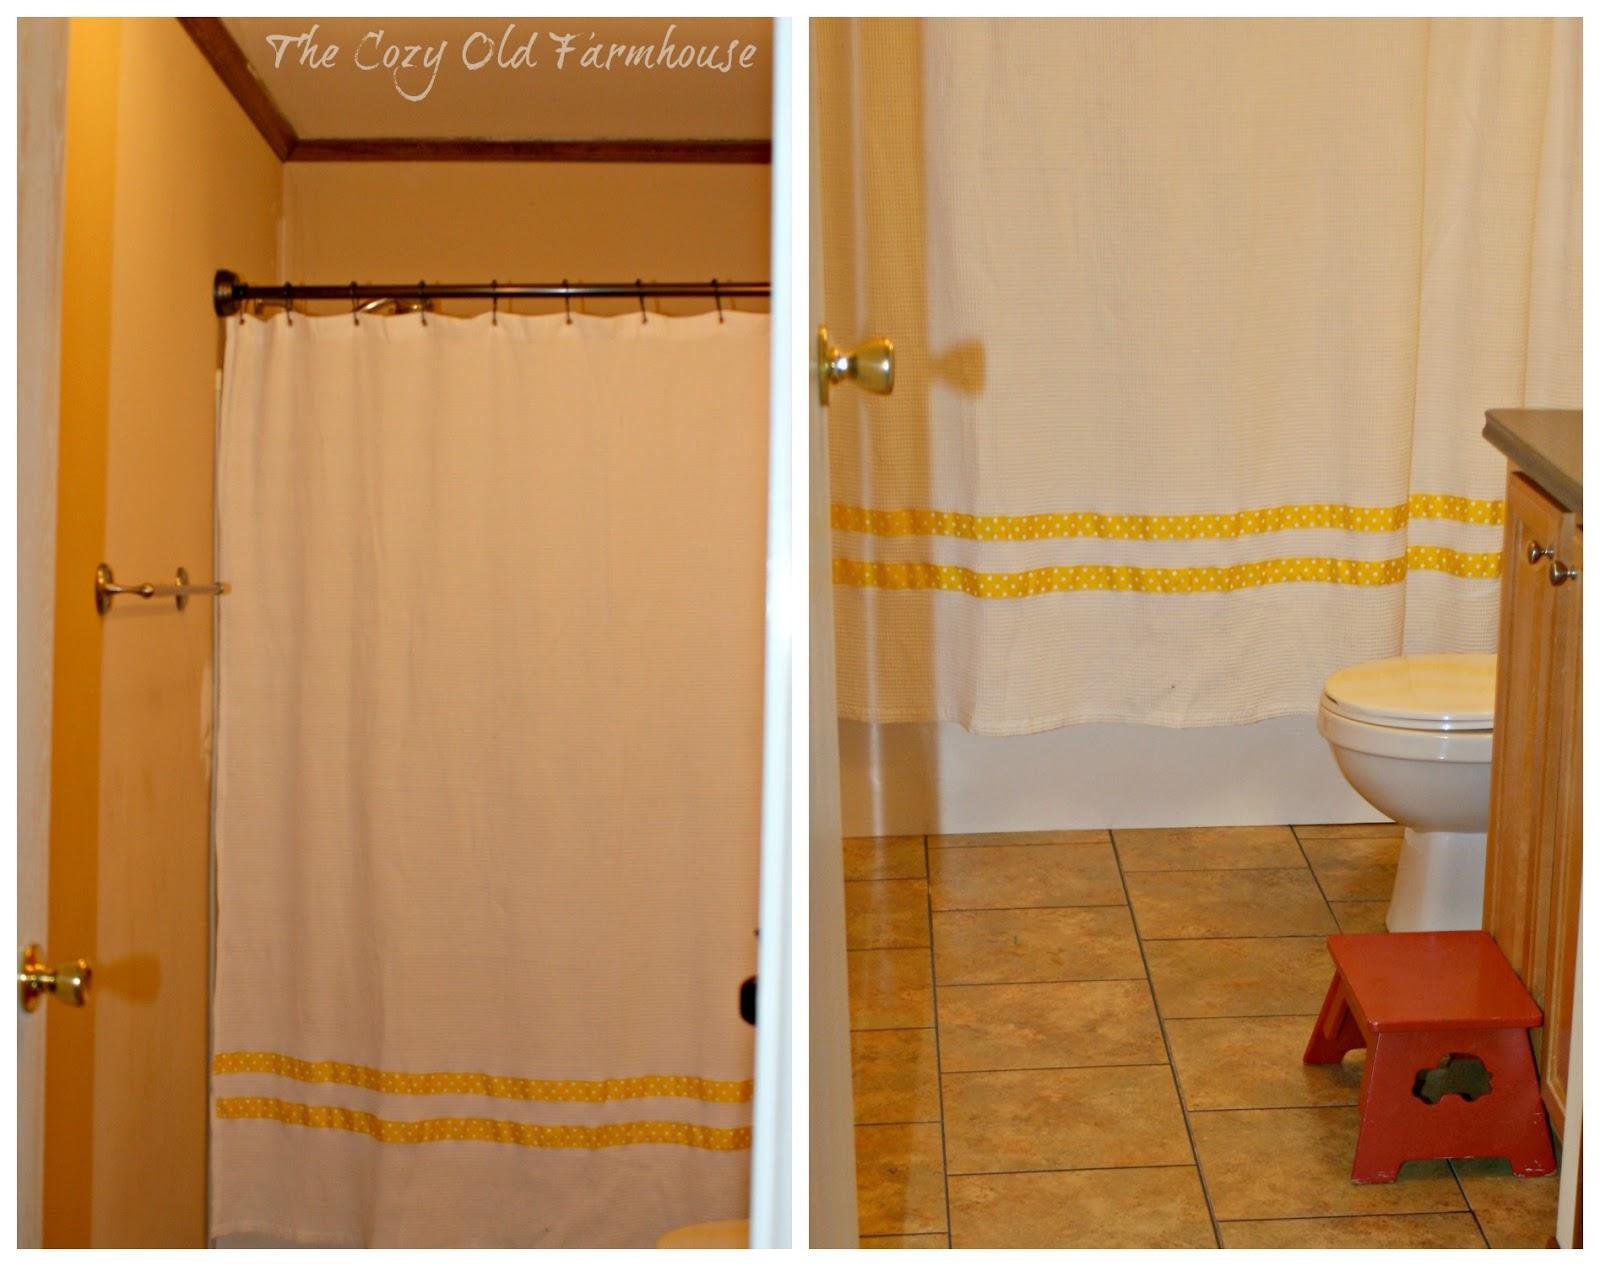 Painteru0027s Dropcloth Becomes DIY Grain Sack Shower Curtain